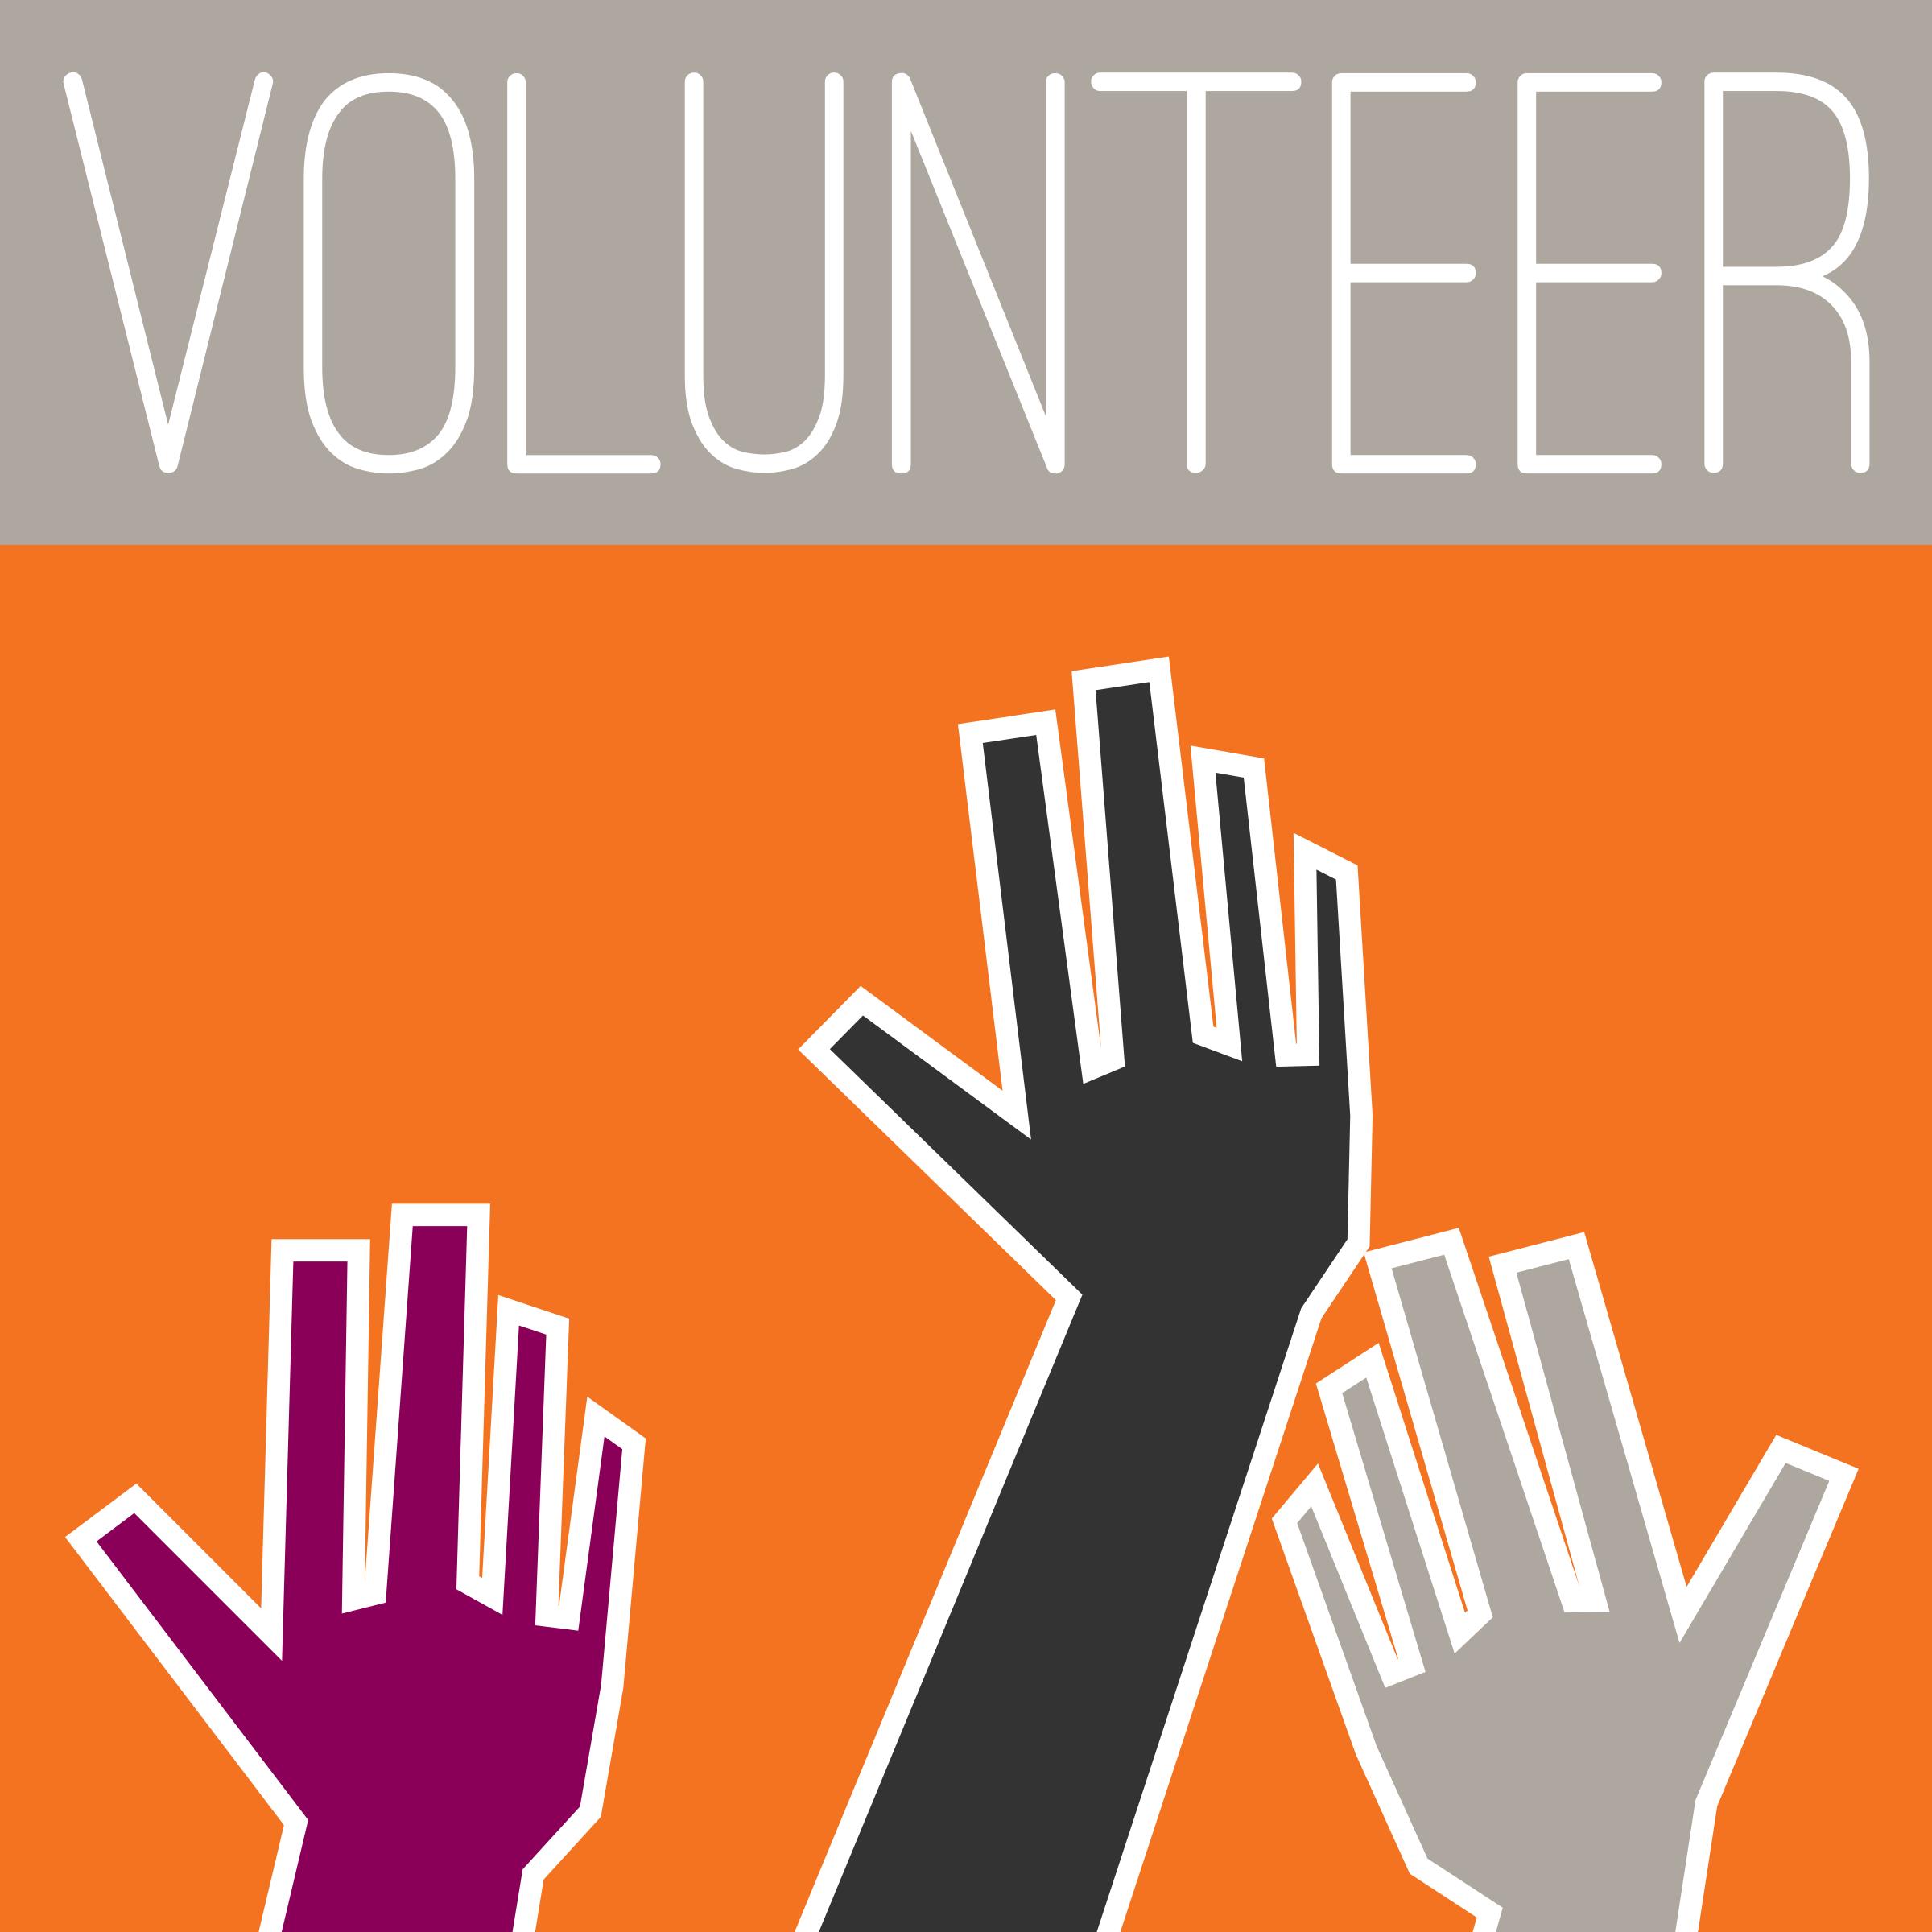 Icon big image png. Volunteering clipart